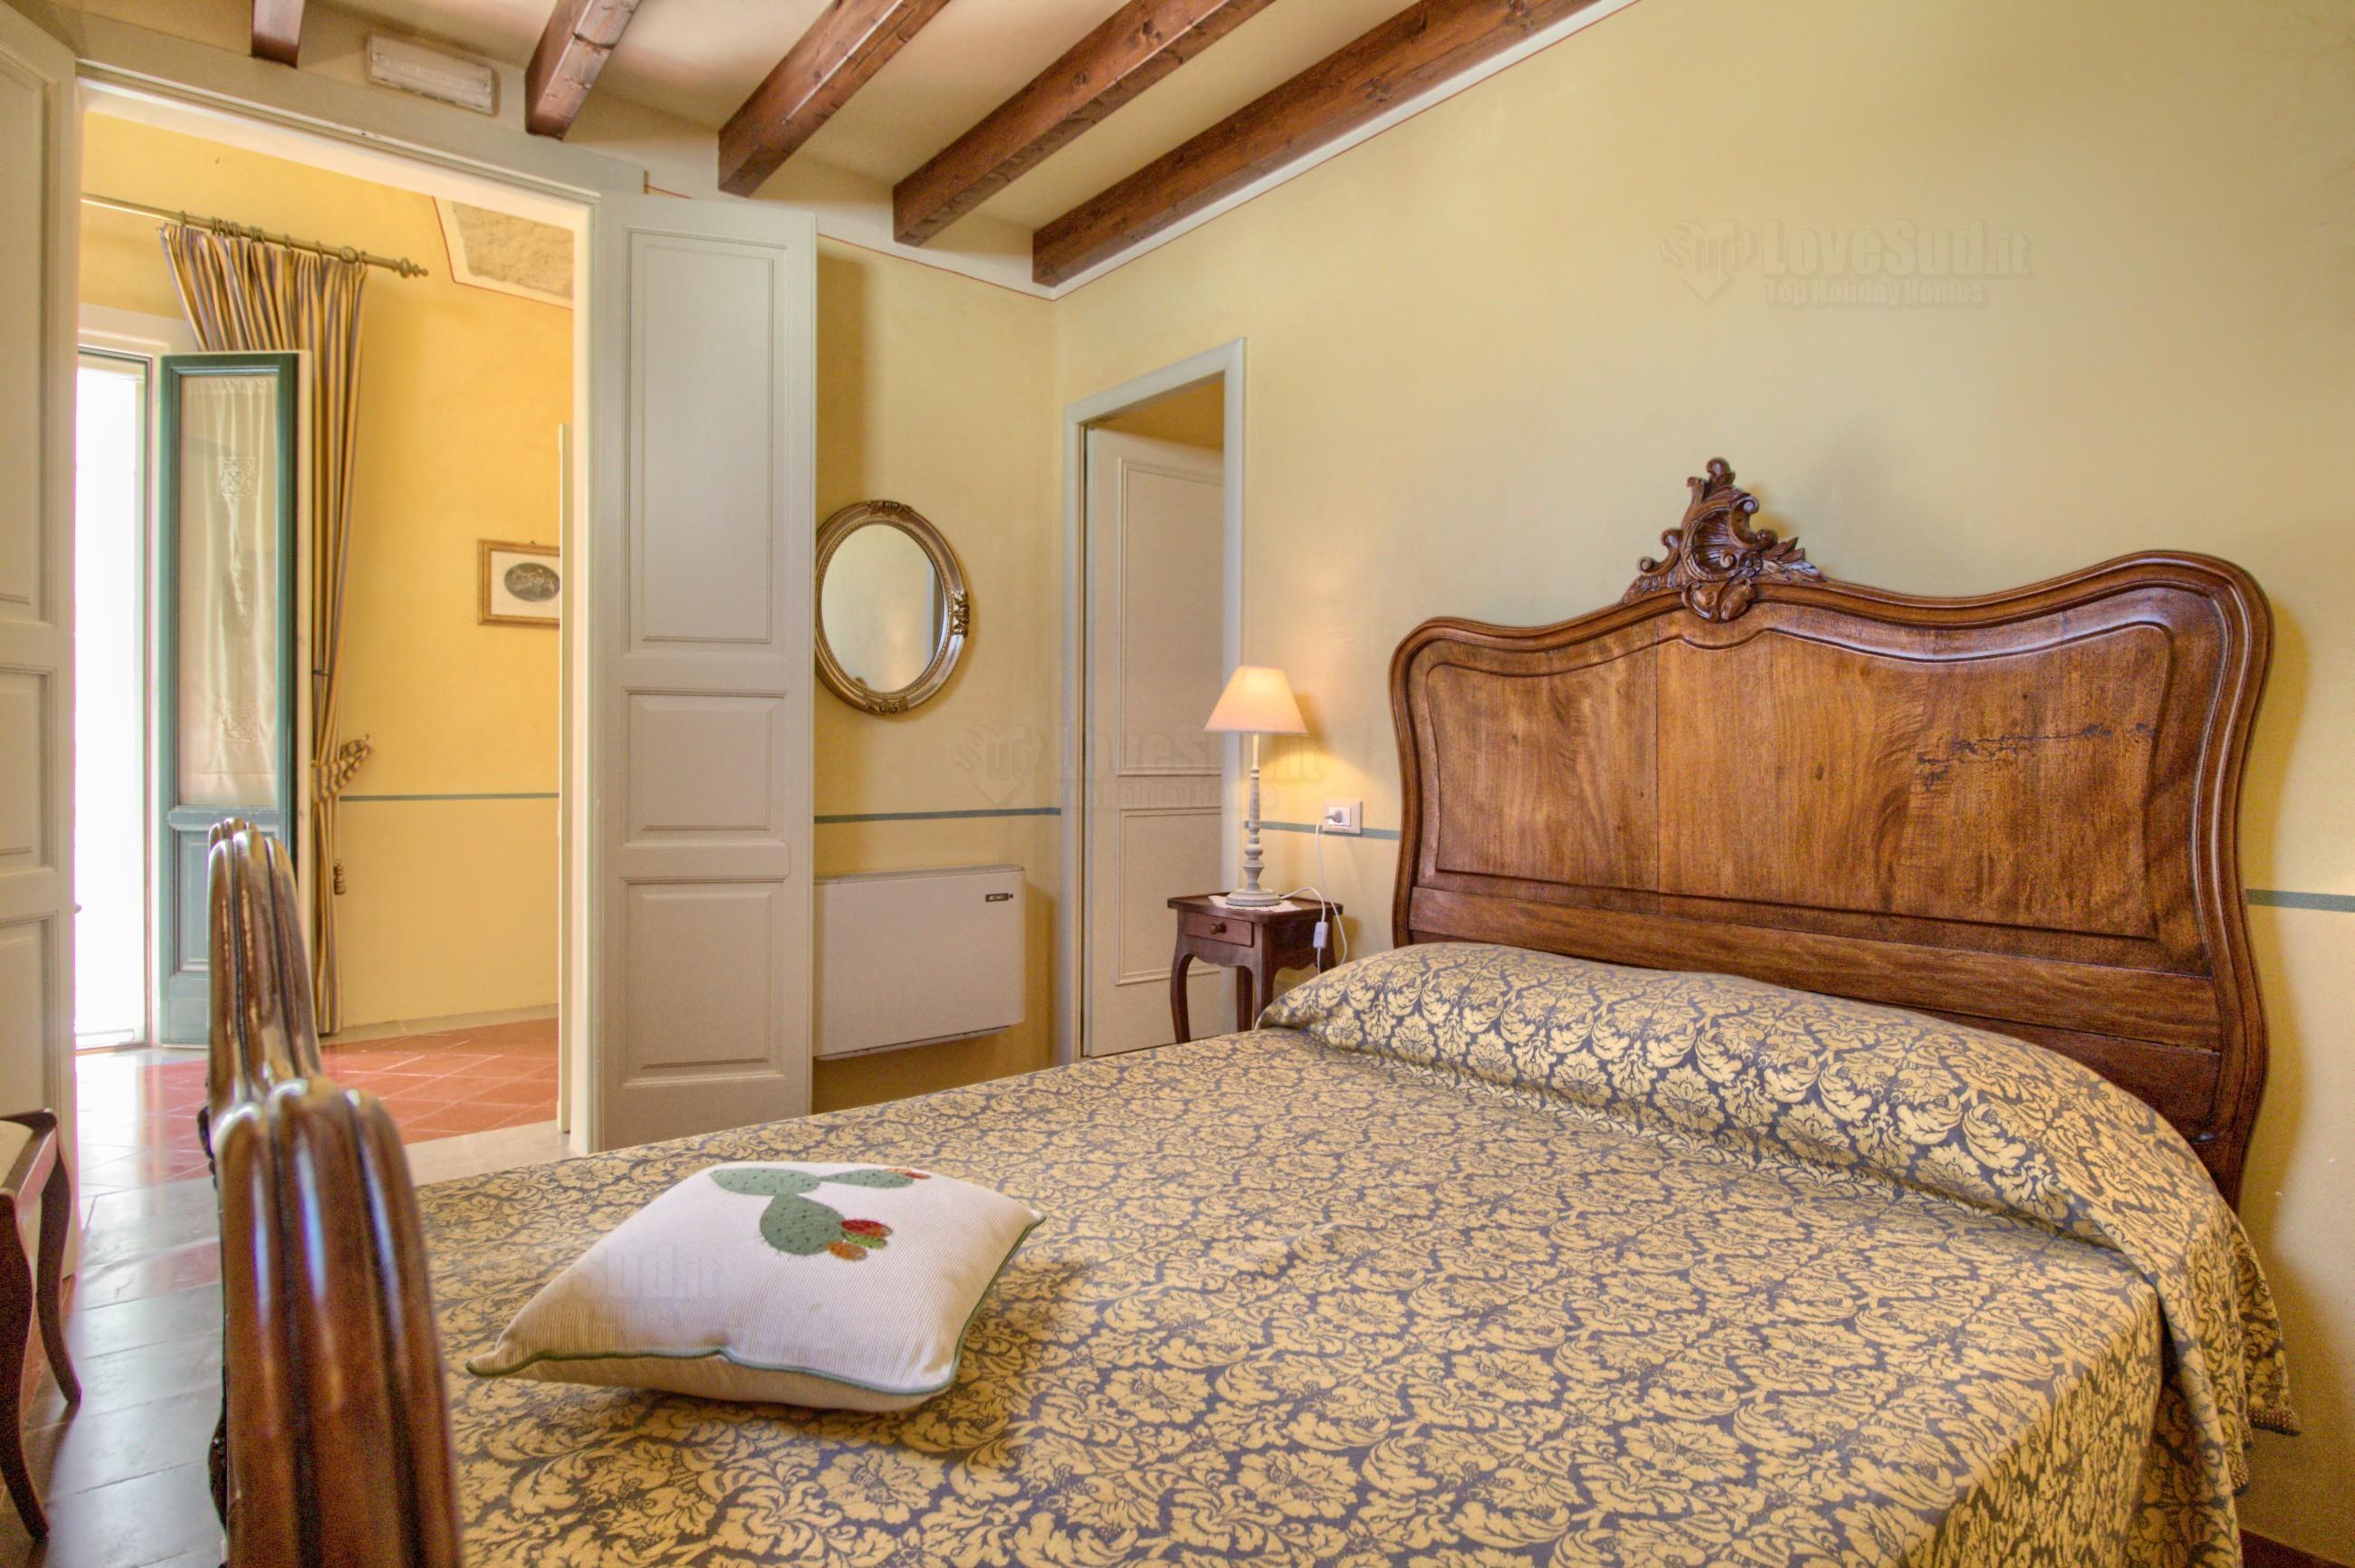 Gialla - B&B A palazzo photo 21630614